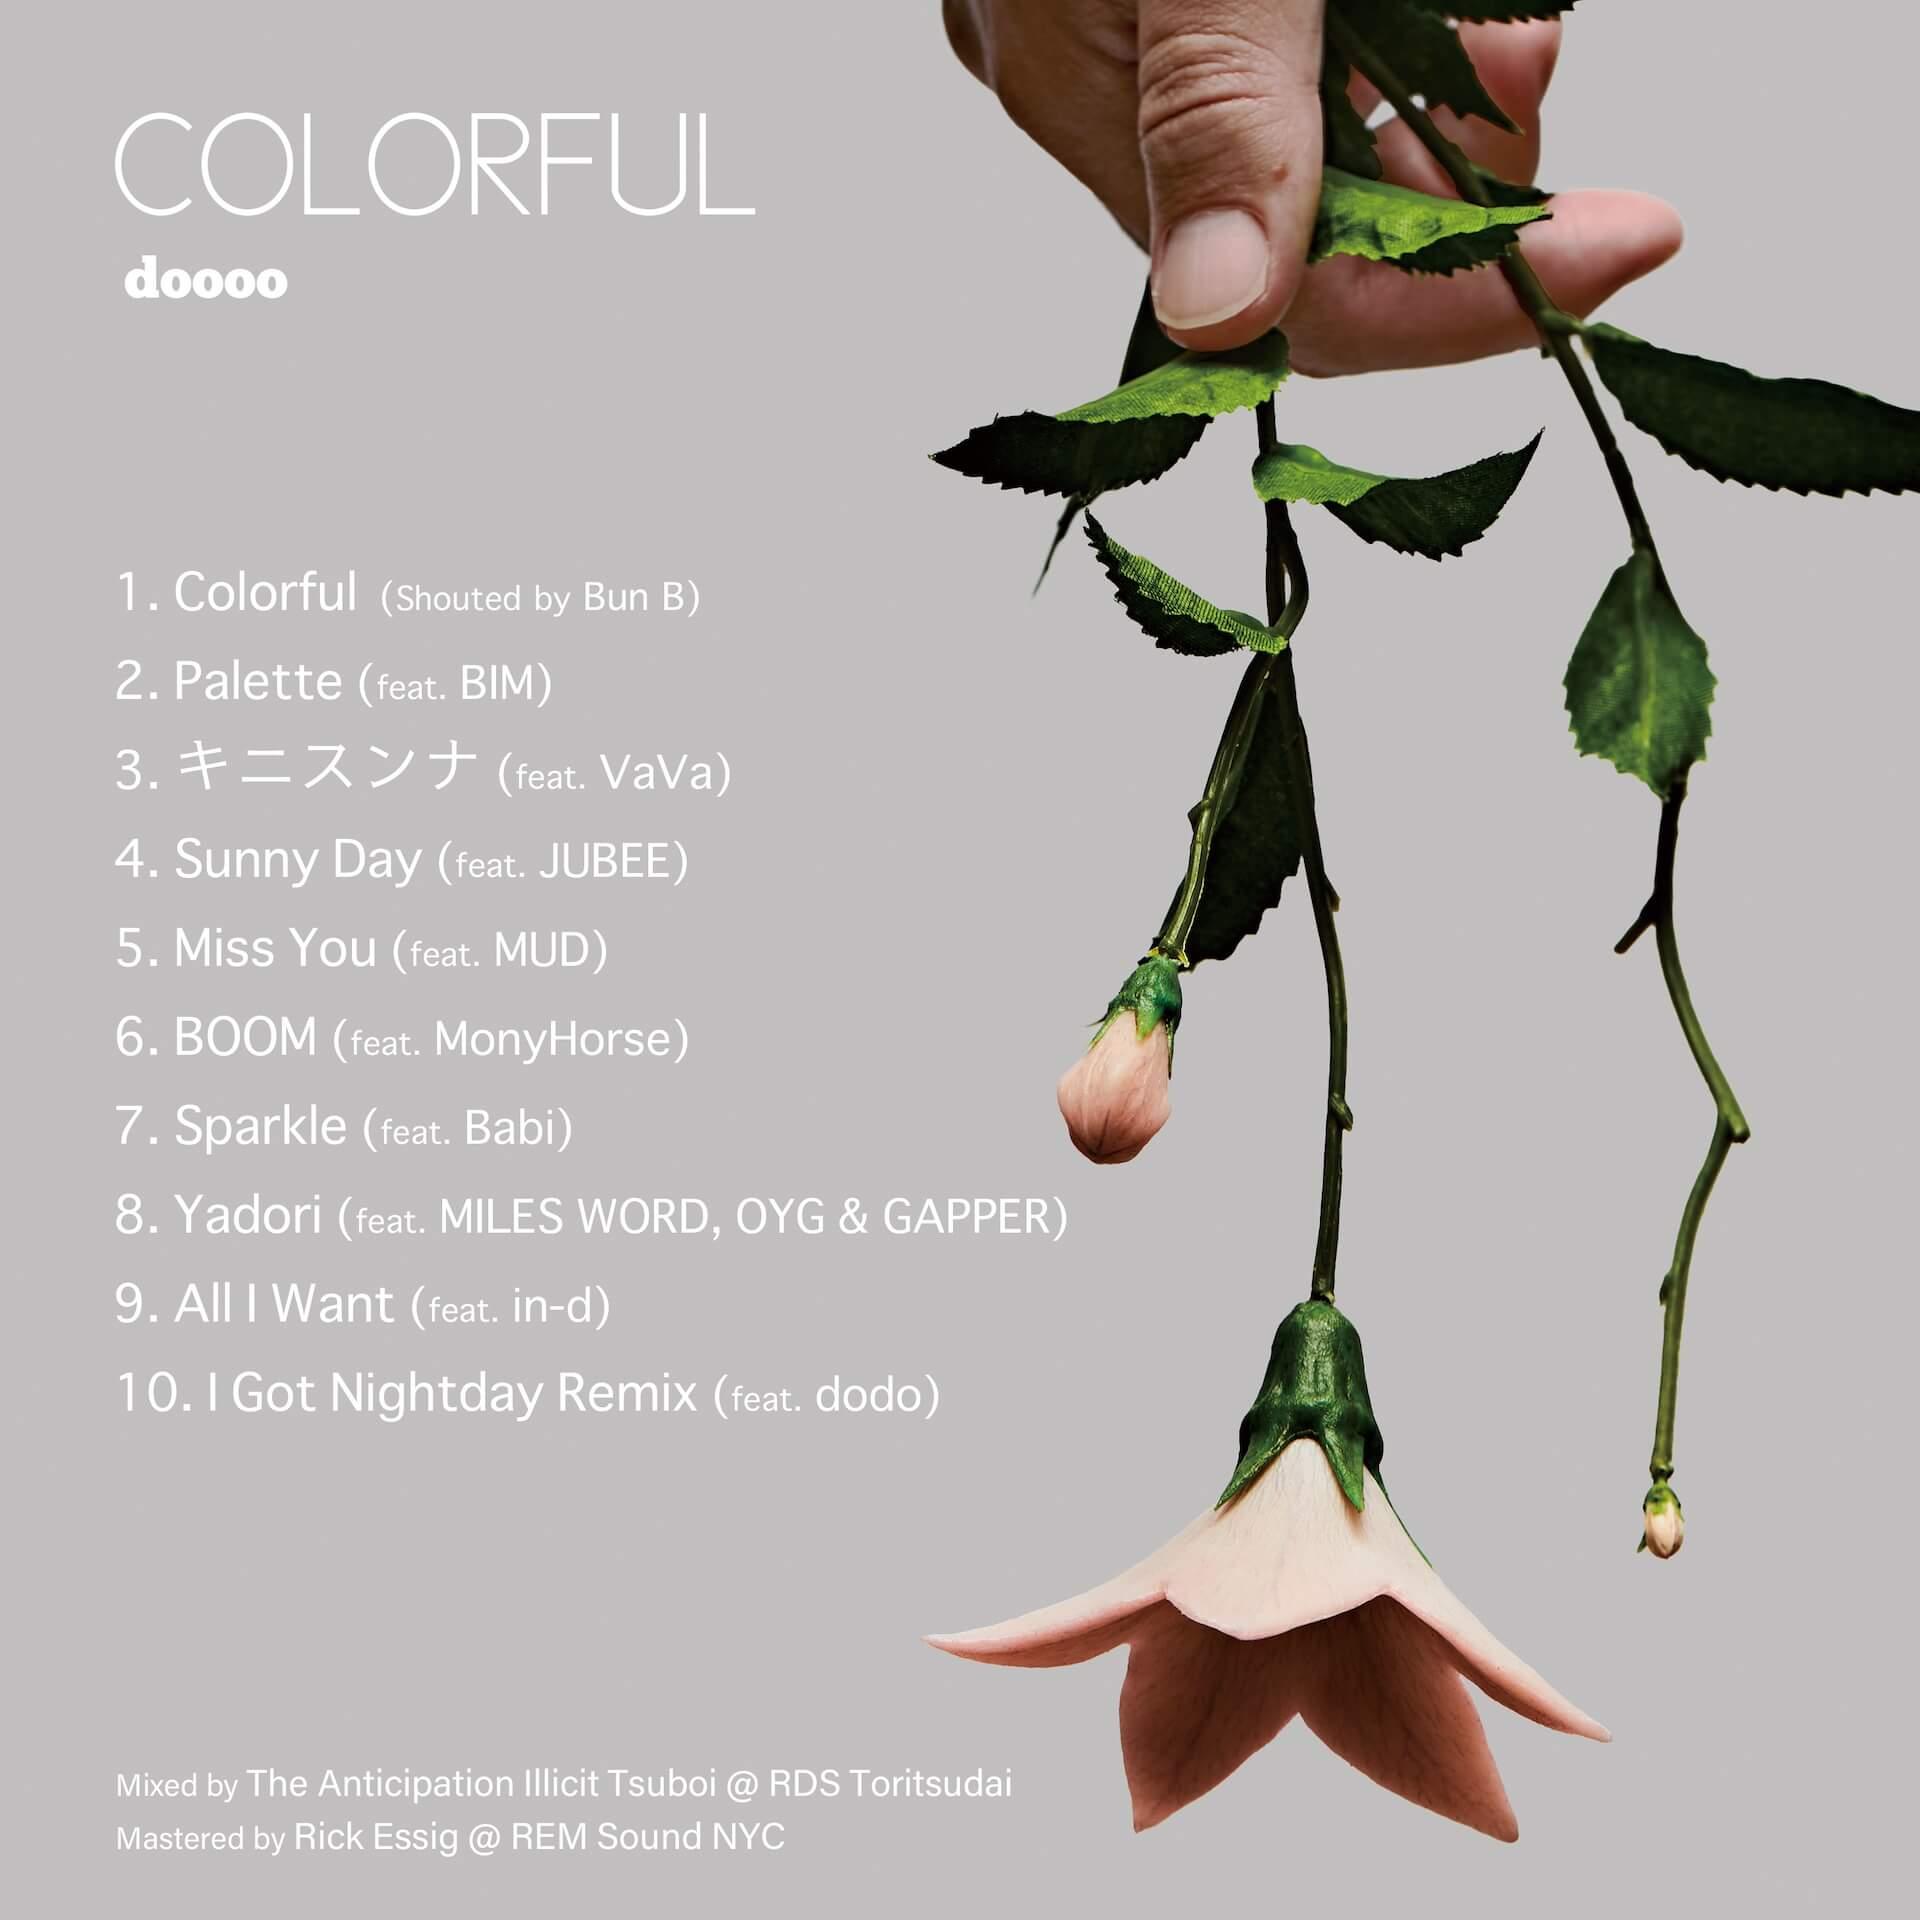 dooooが10月にリリースする2ndアルバム『COLORFUL』の予約販売スタート!話題の「人肉USB」でもリリース music210916_doooo_colorfull_02